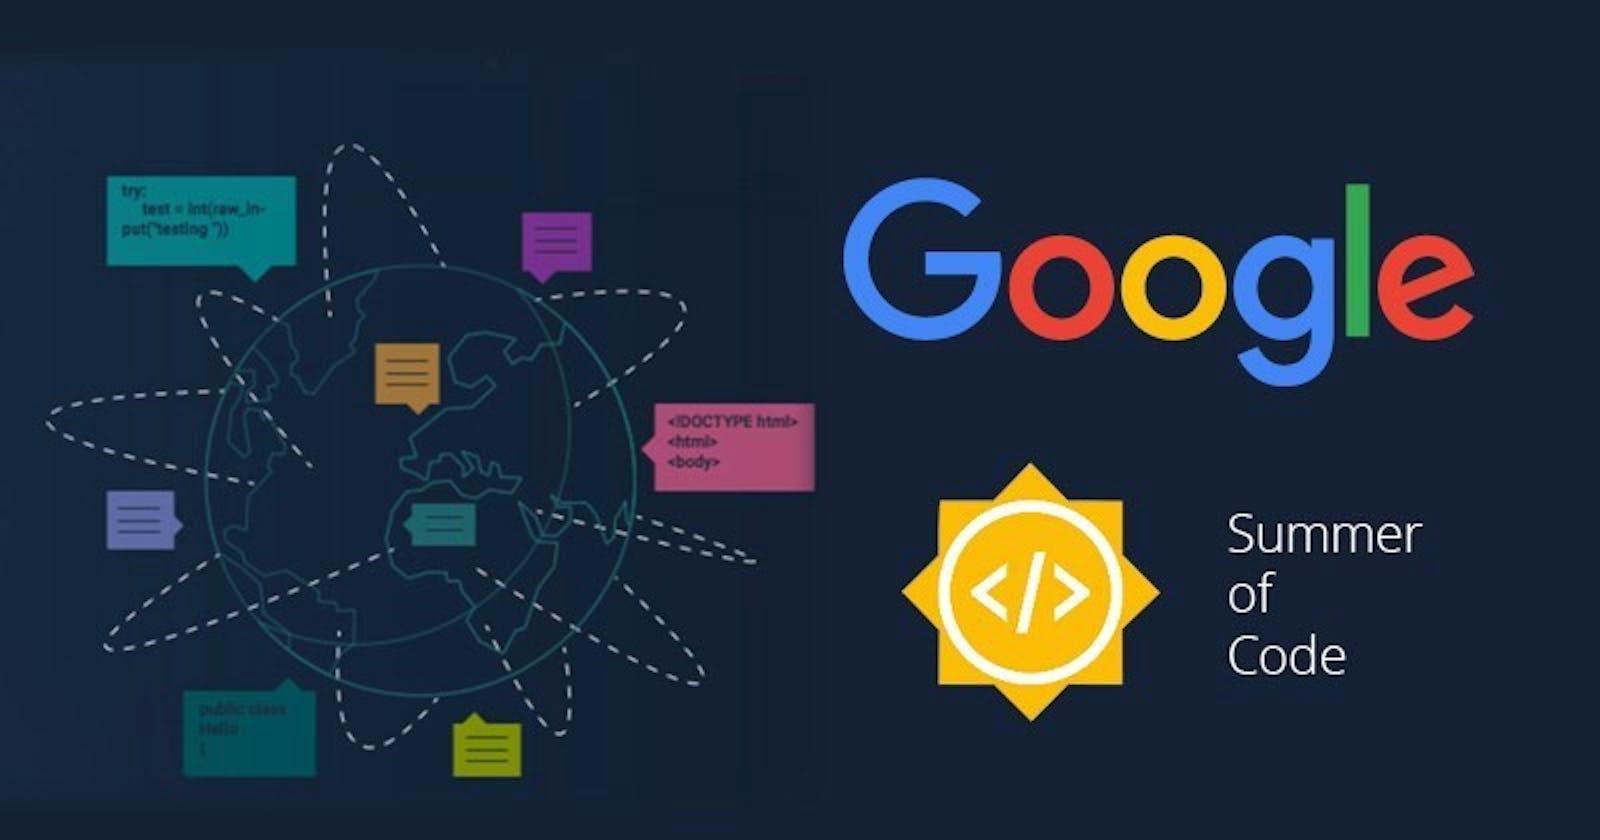 Finding an organization for google summer of code